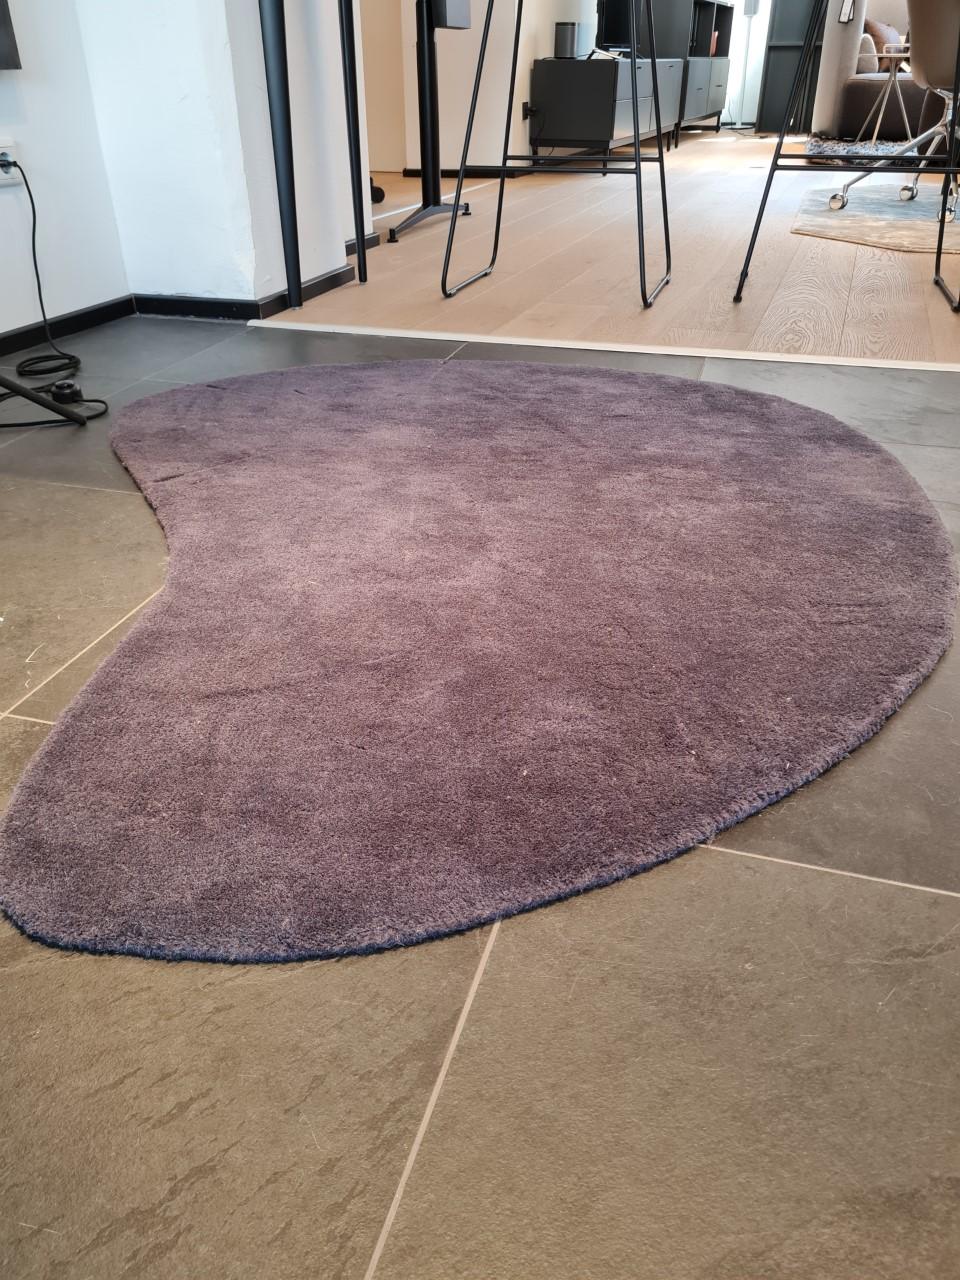 Palinuro Teppich 125 x 150 cm